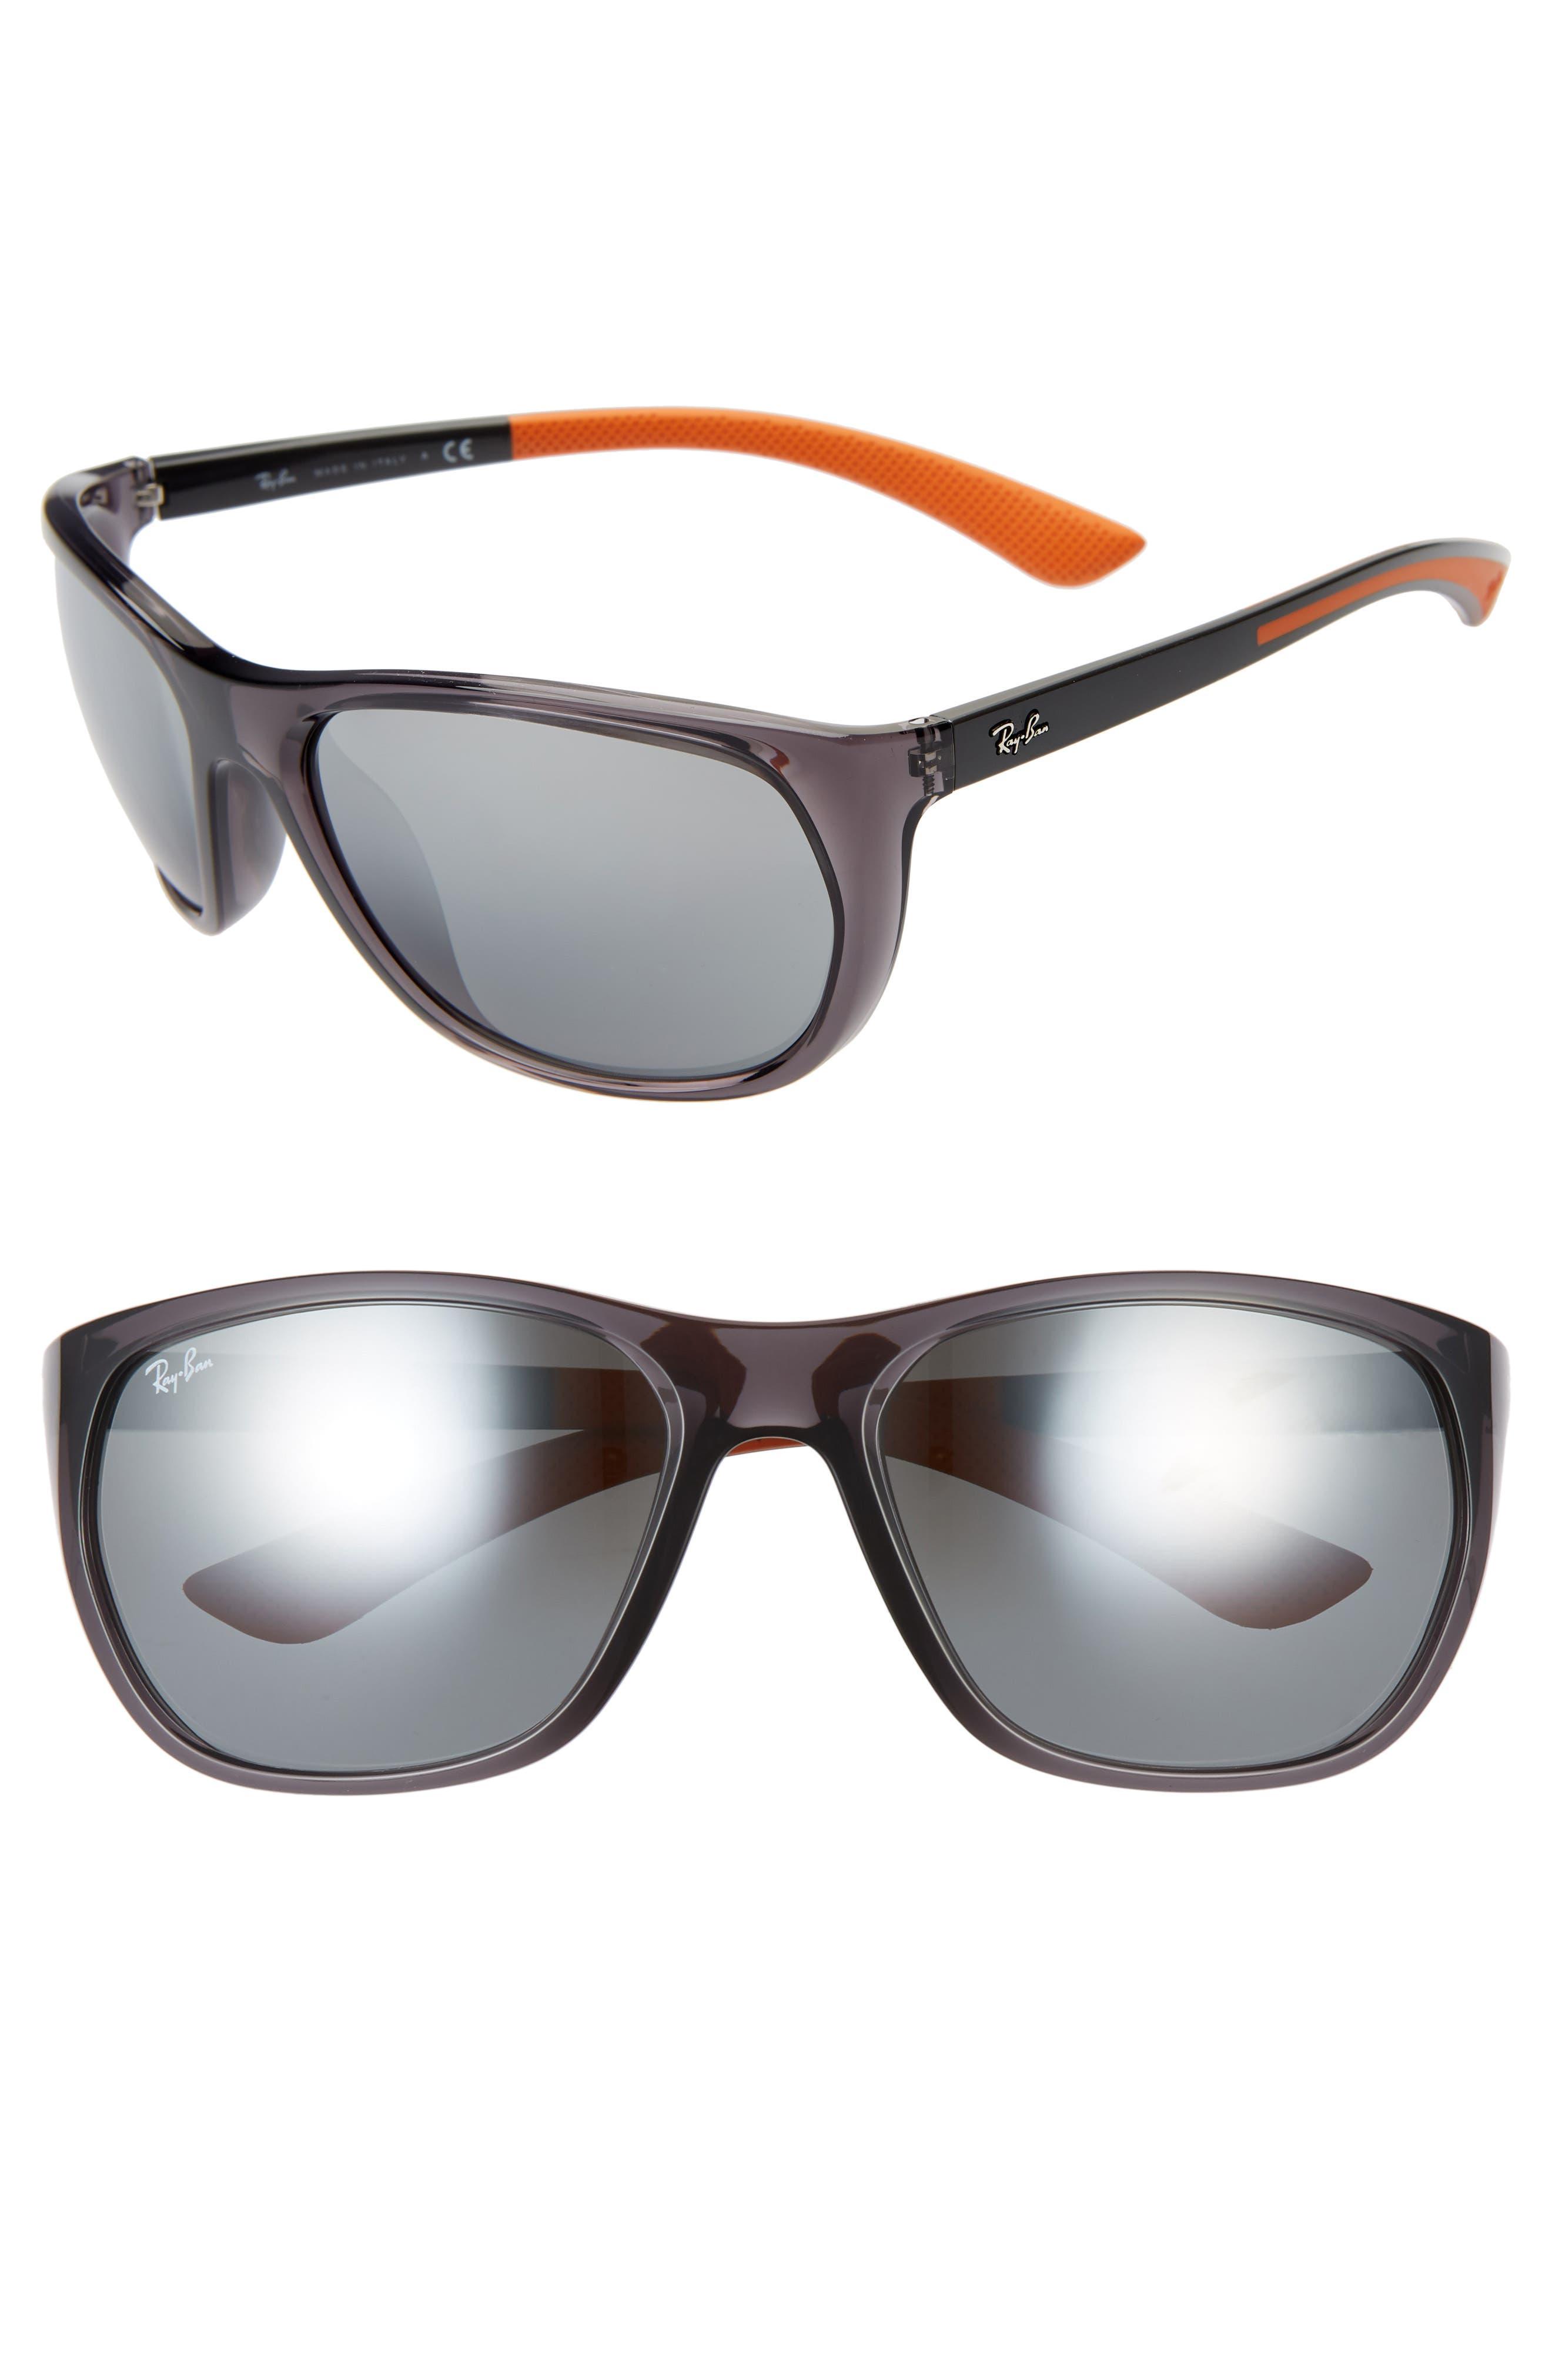 Ray-Ban 61Mm Wrap Sunglasses - Trasparent Grey